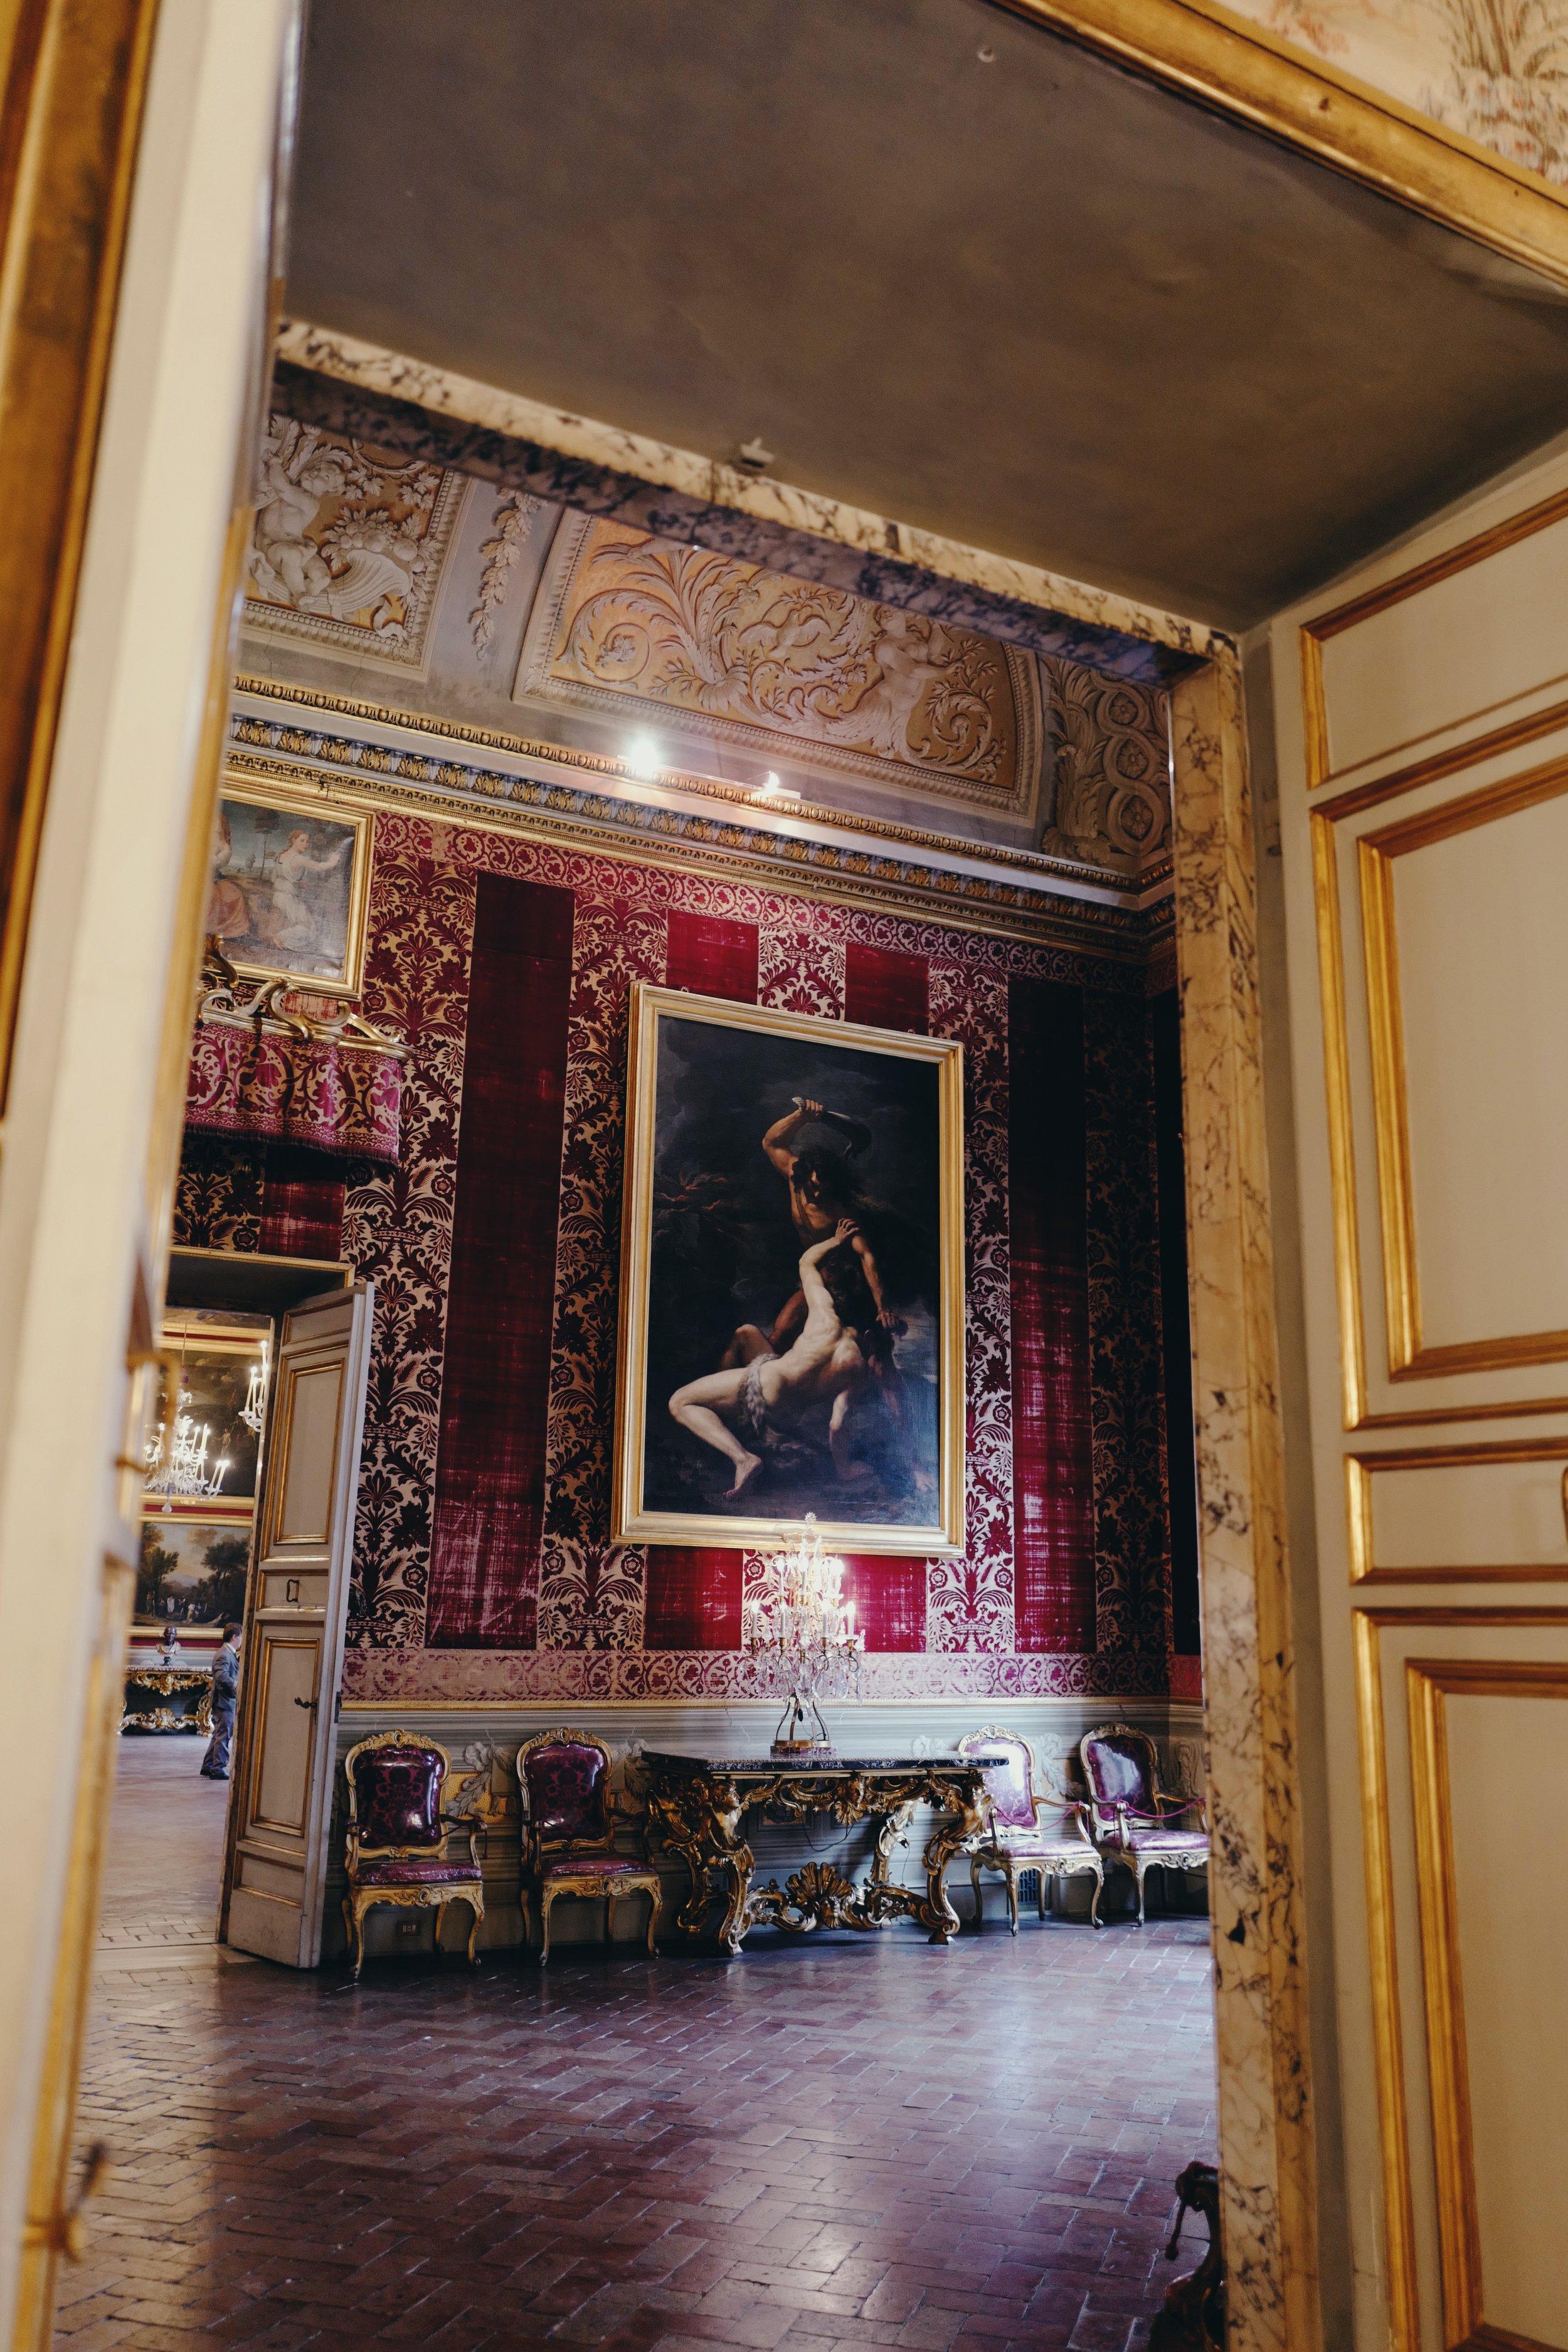 Galleria Doria Pamphilj: Entrance to the Velvets Room (the walls are covered in damask velvet)